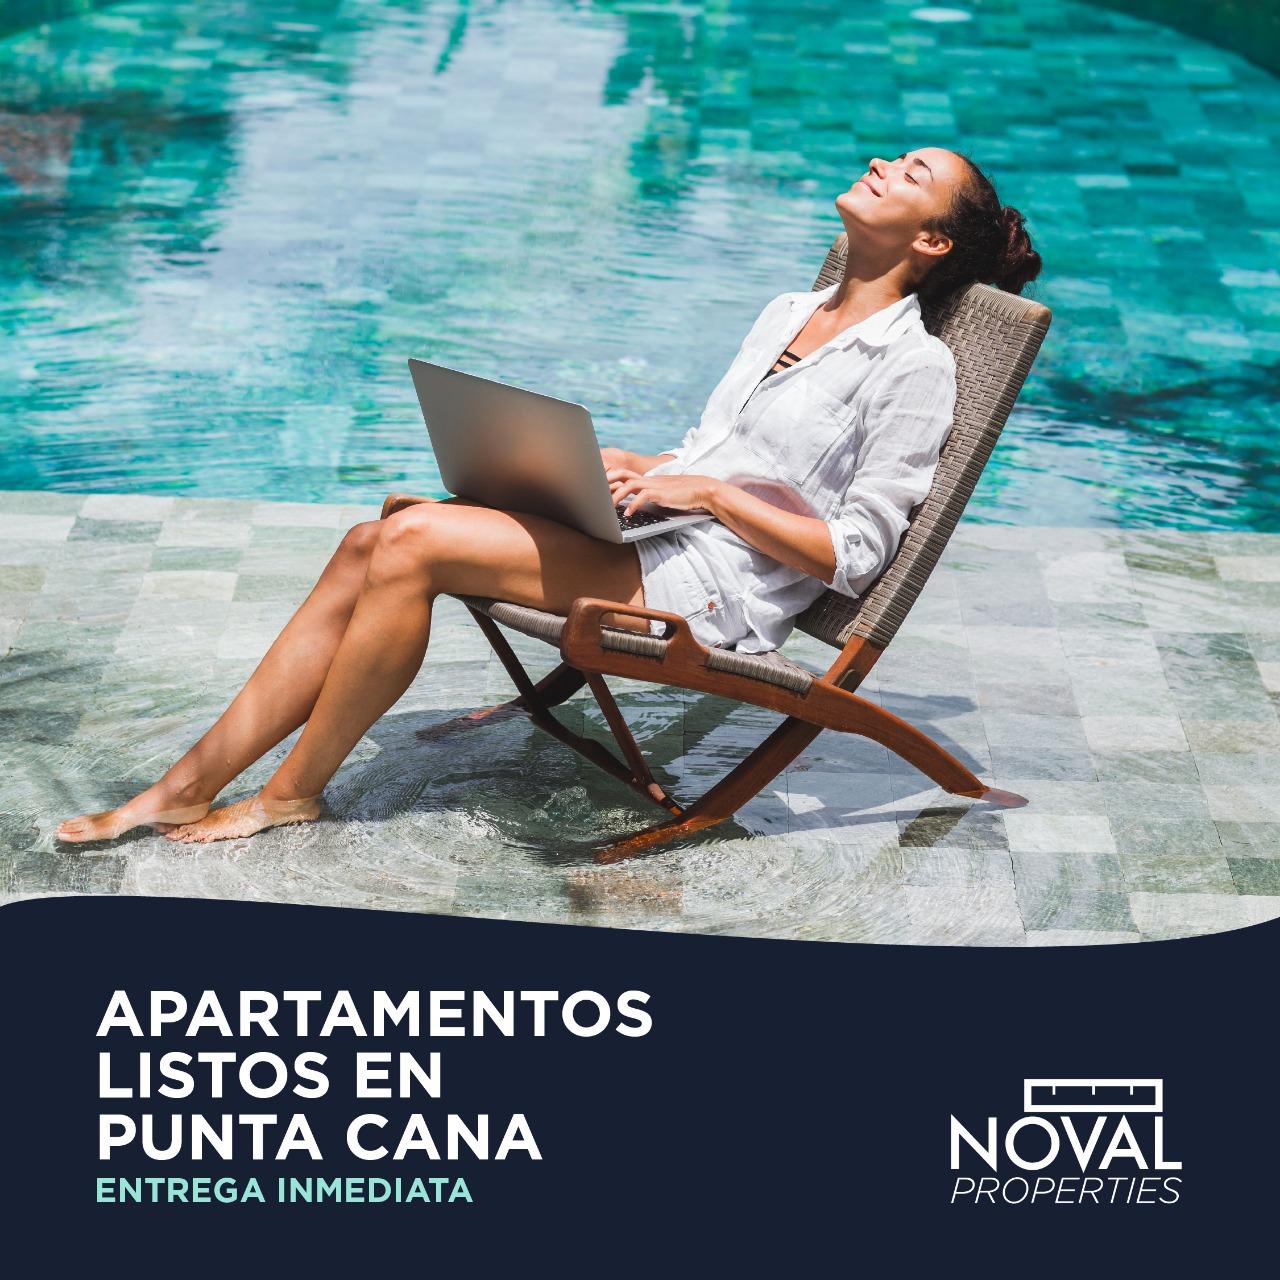 Propiedades de Noval en Punta Cana (12)